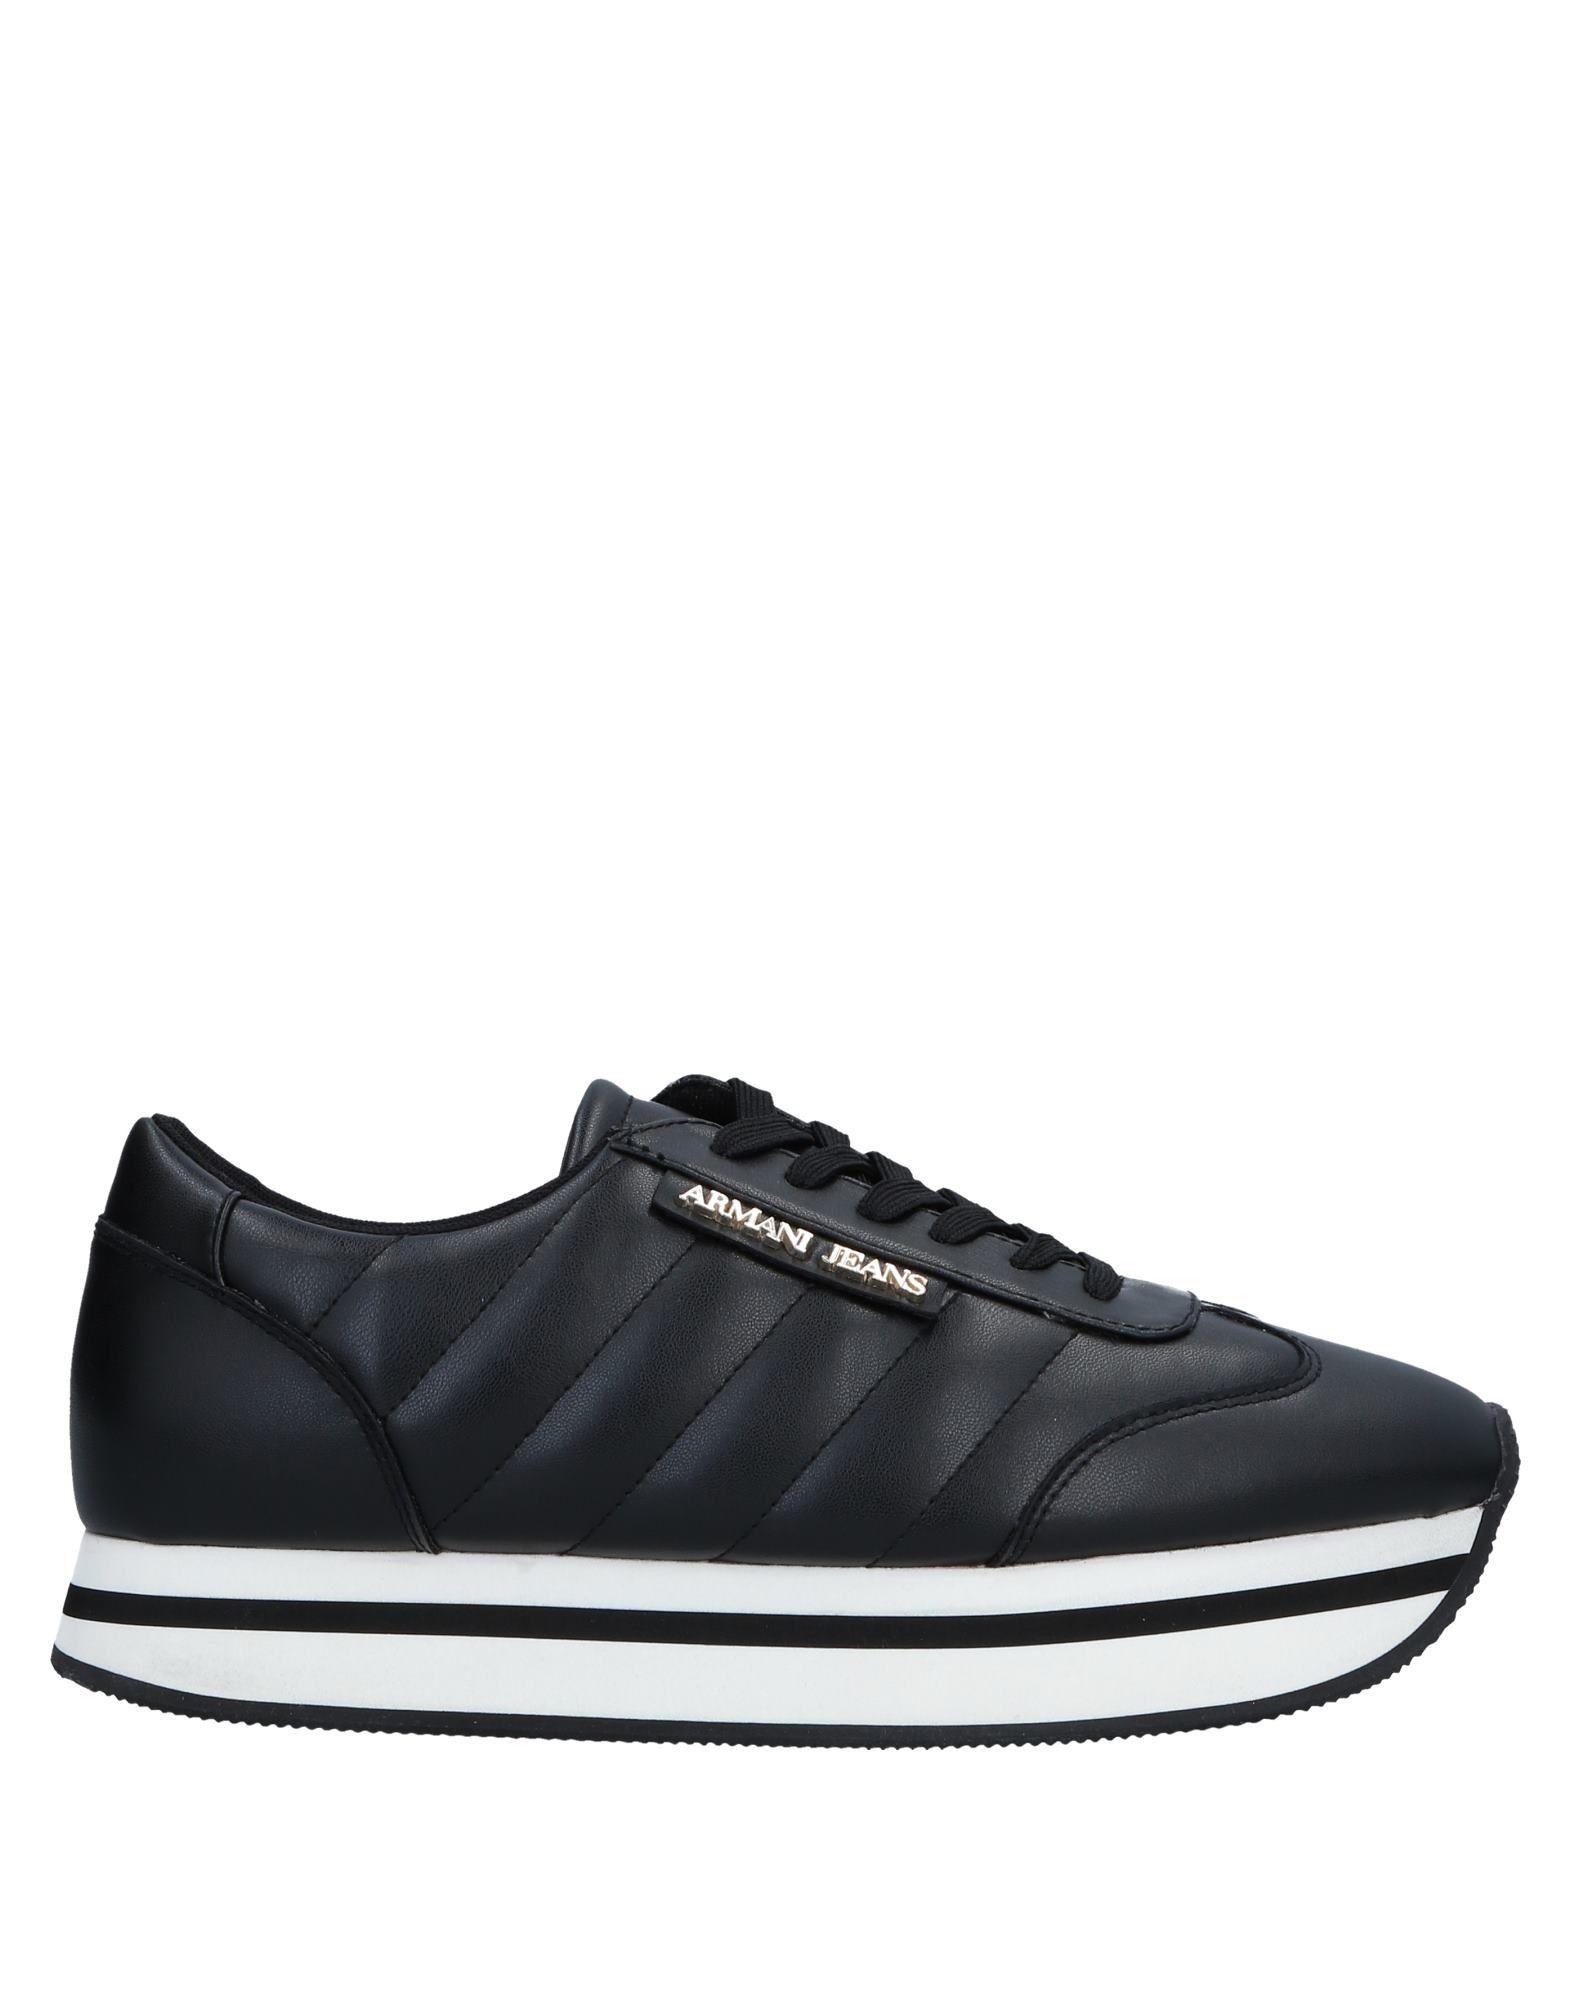 Stilvolle billige Schuhe Damen Armani Jeans Sneakers Damen Schuhe  11529729LA 5e2426